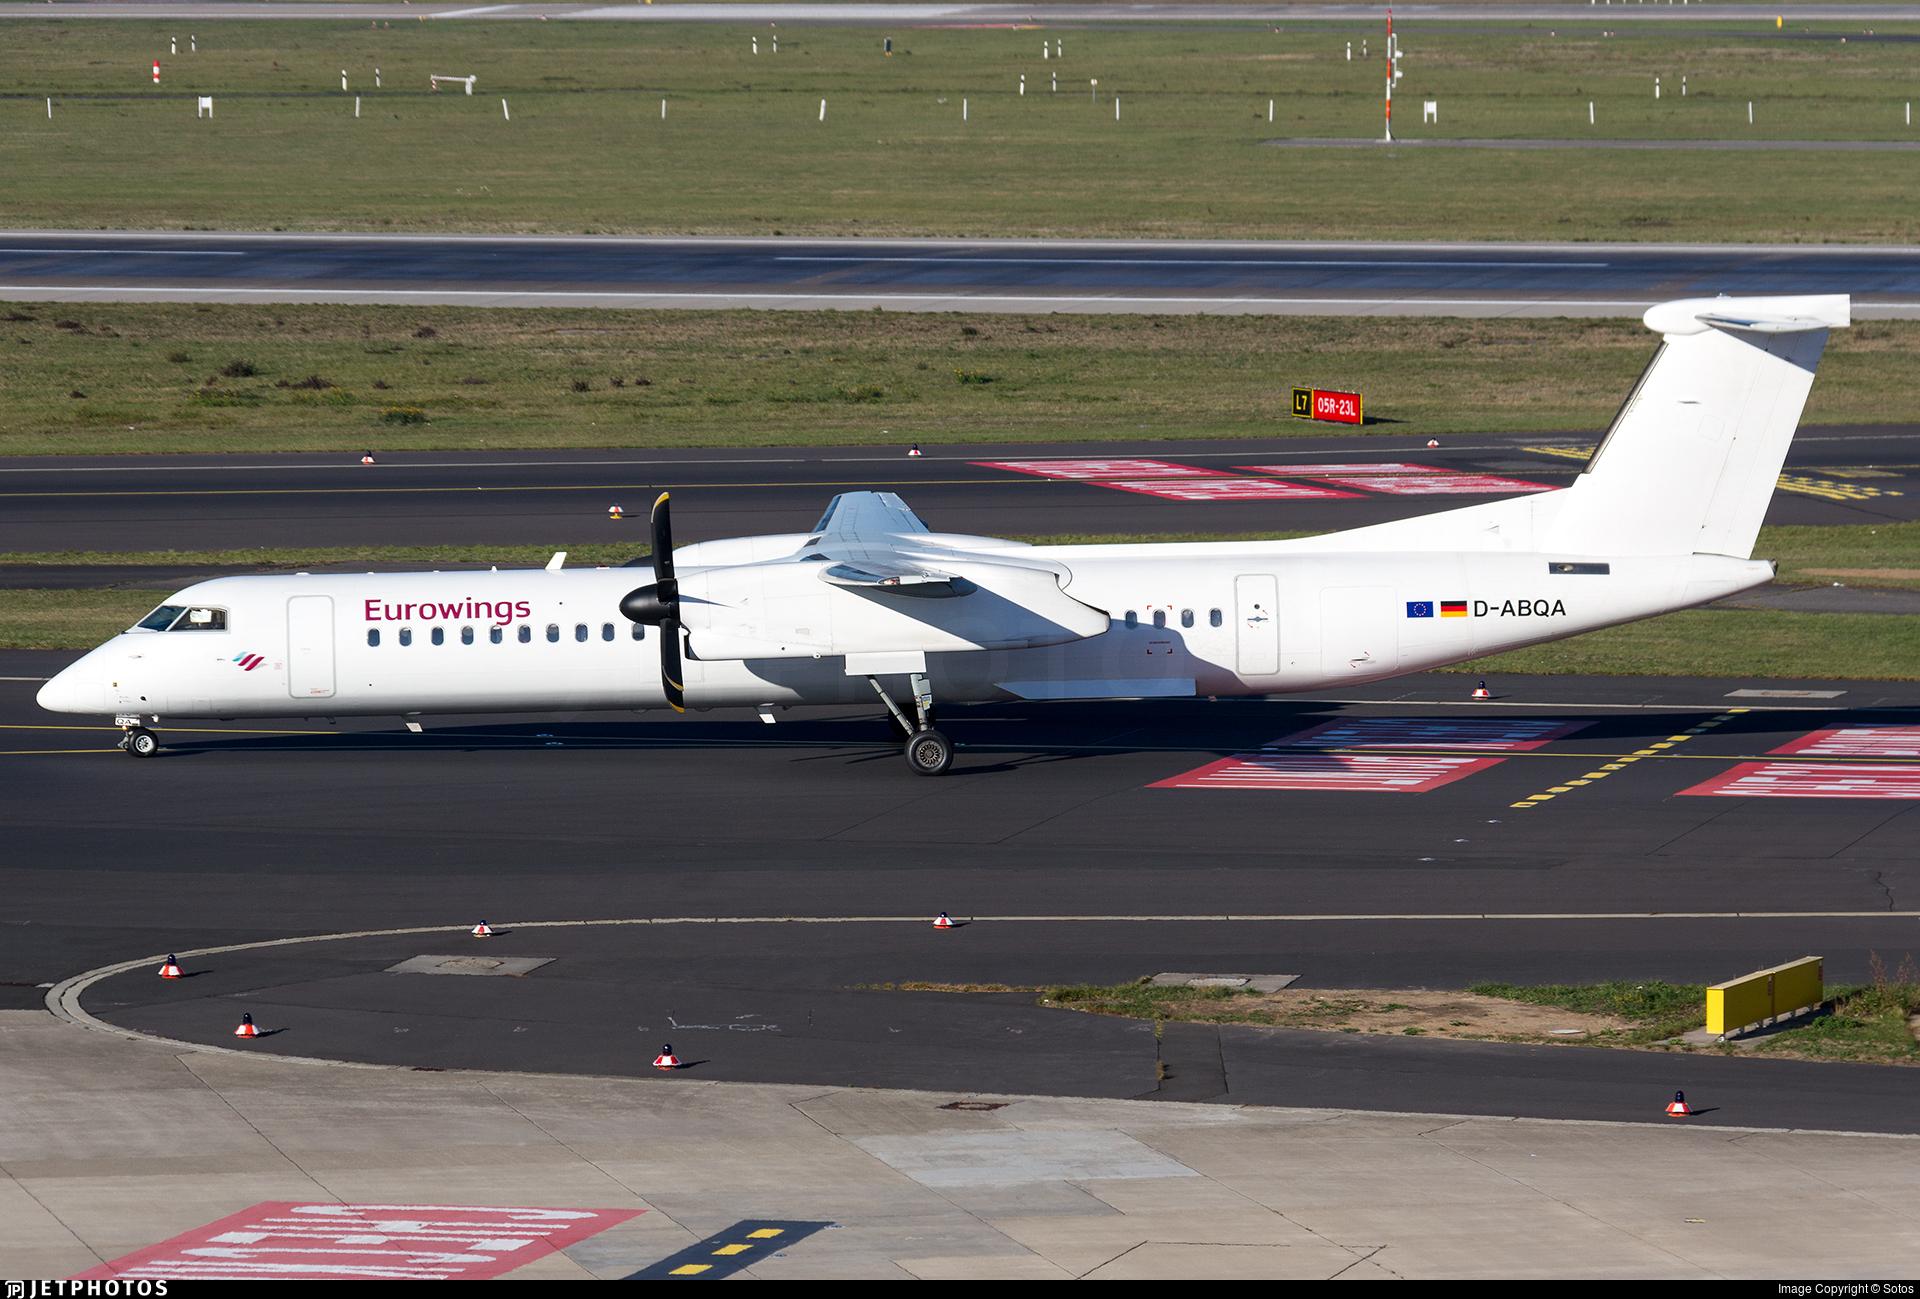 D-ABQA - Bombardier Dash 8-Q402 - Eurowings (LGW Luftfahrtgesellschaft Walter)